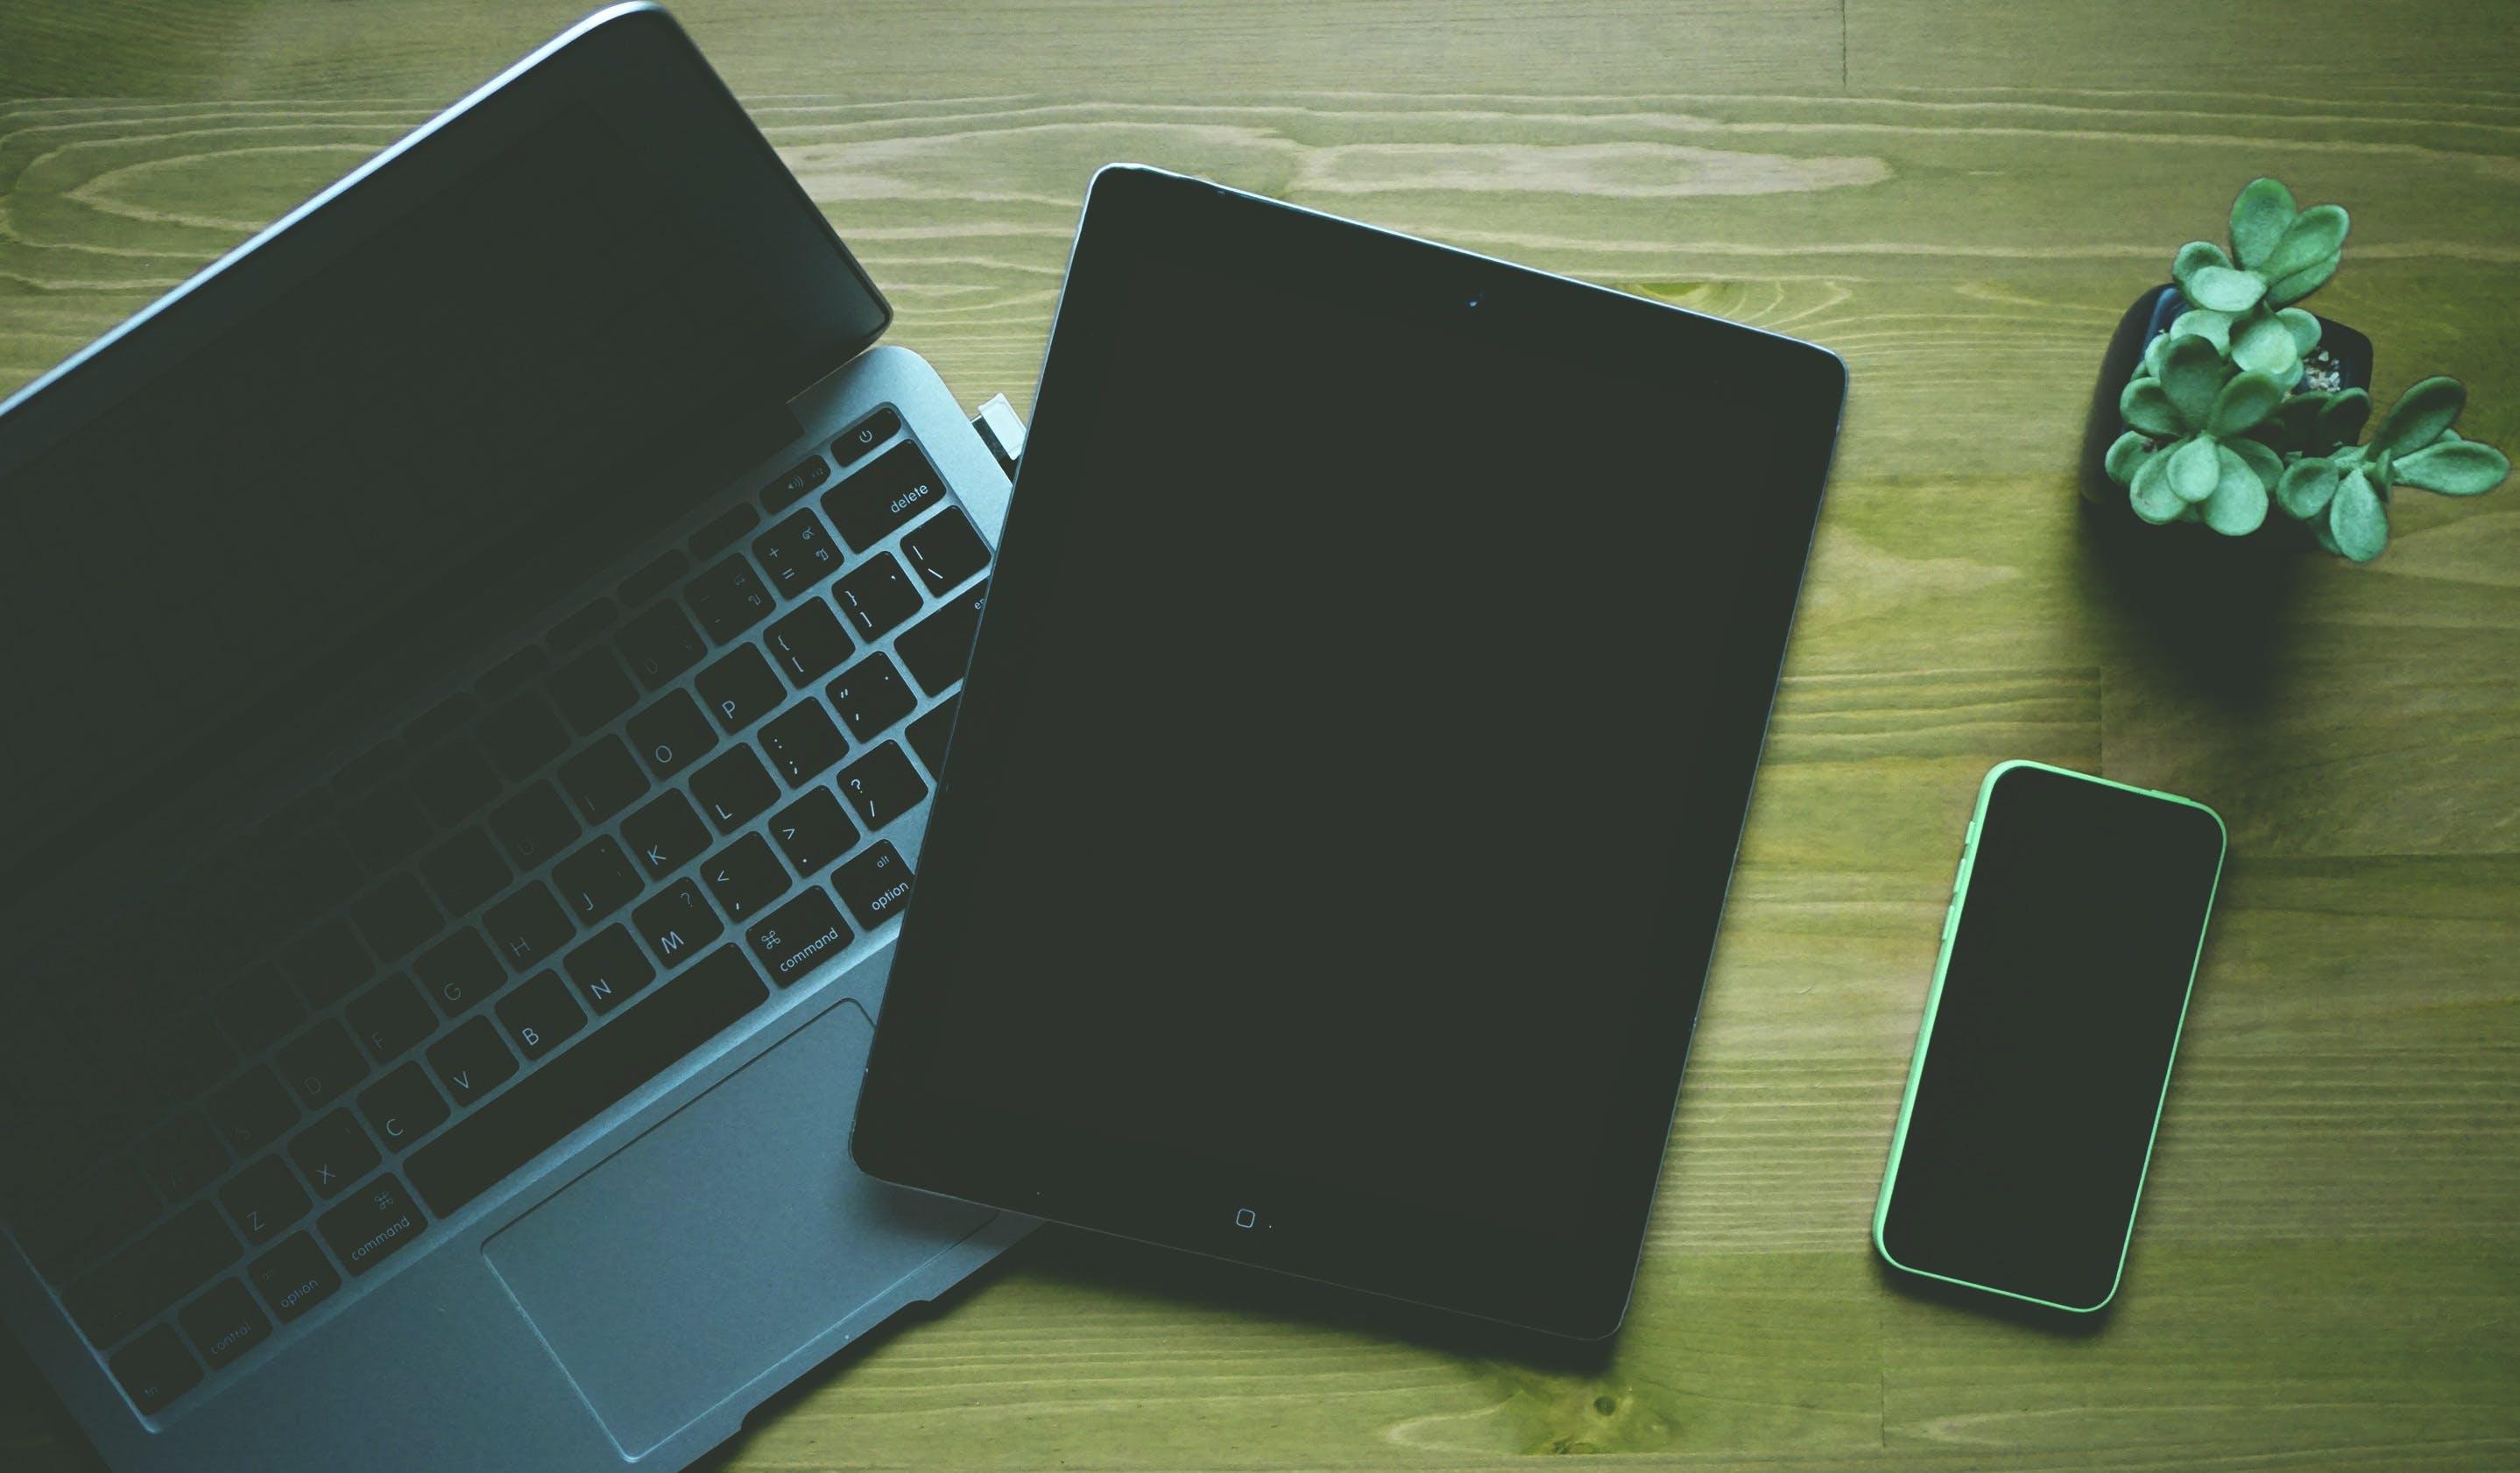 Black Ipad Beside Green Iphone 5c